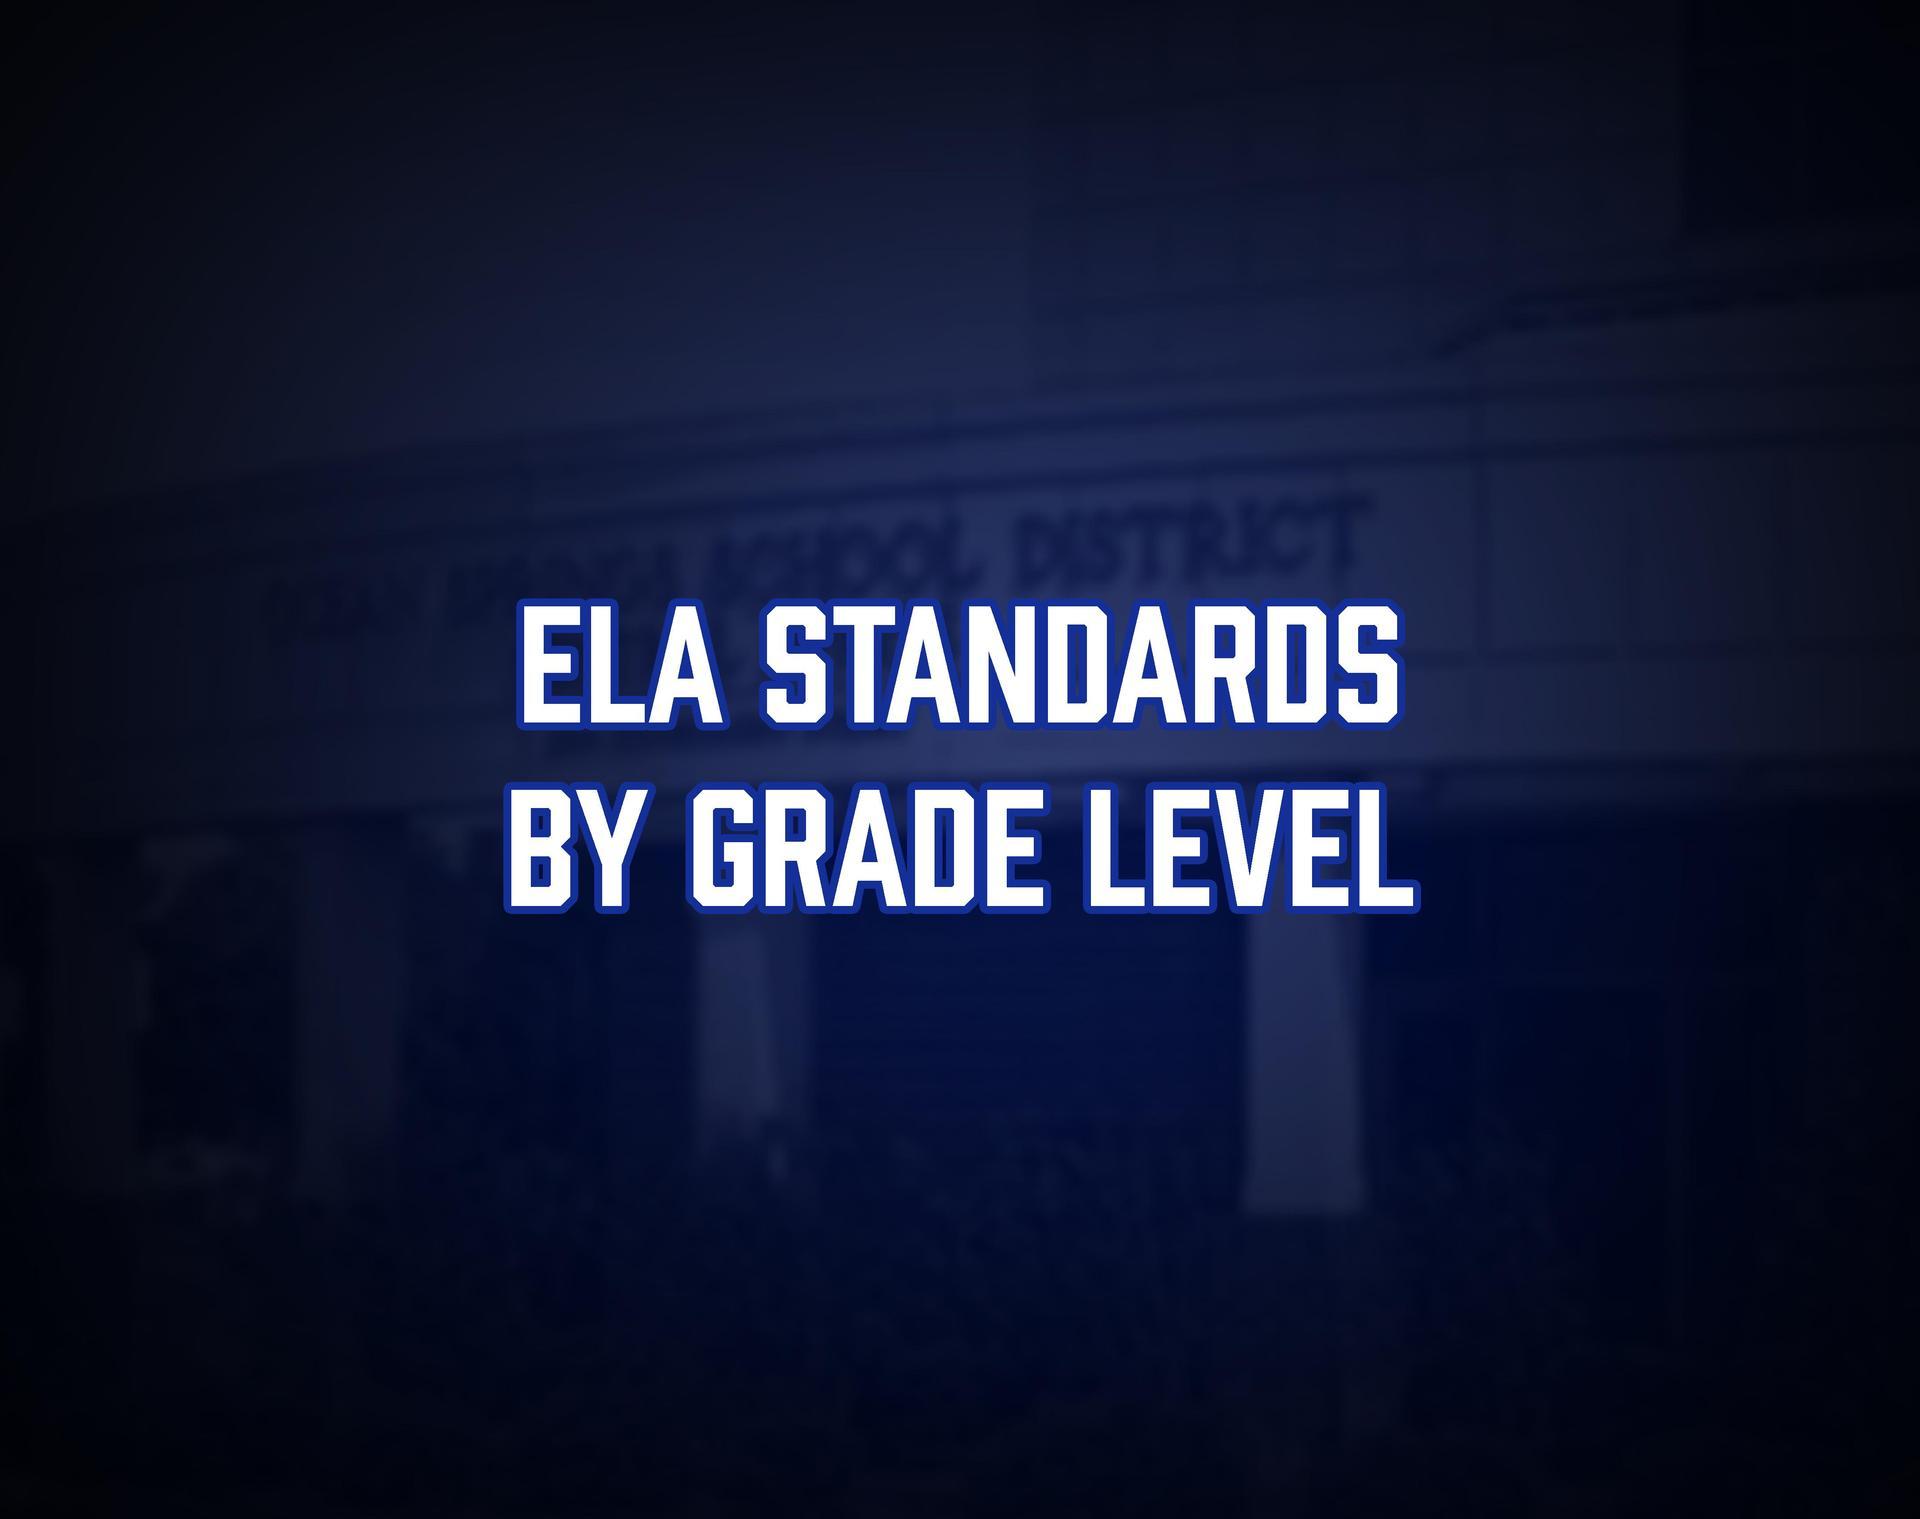 ELA Standards by Grade Level